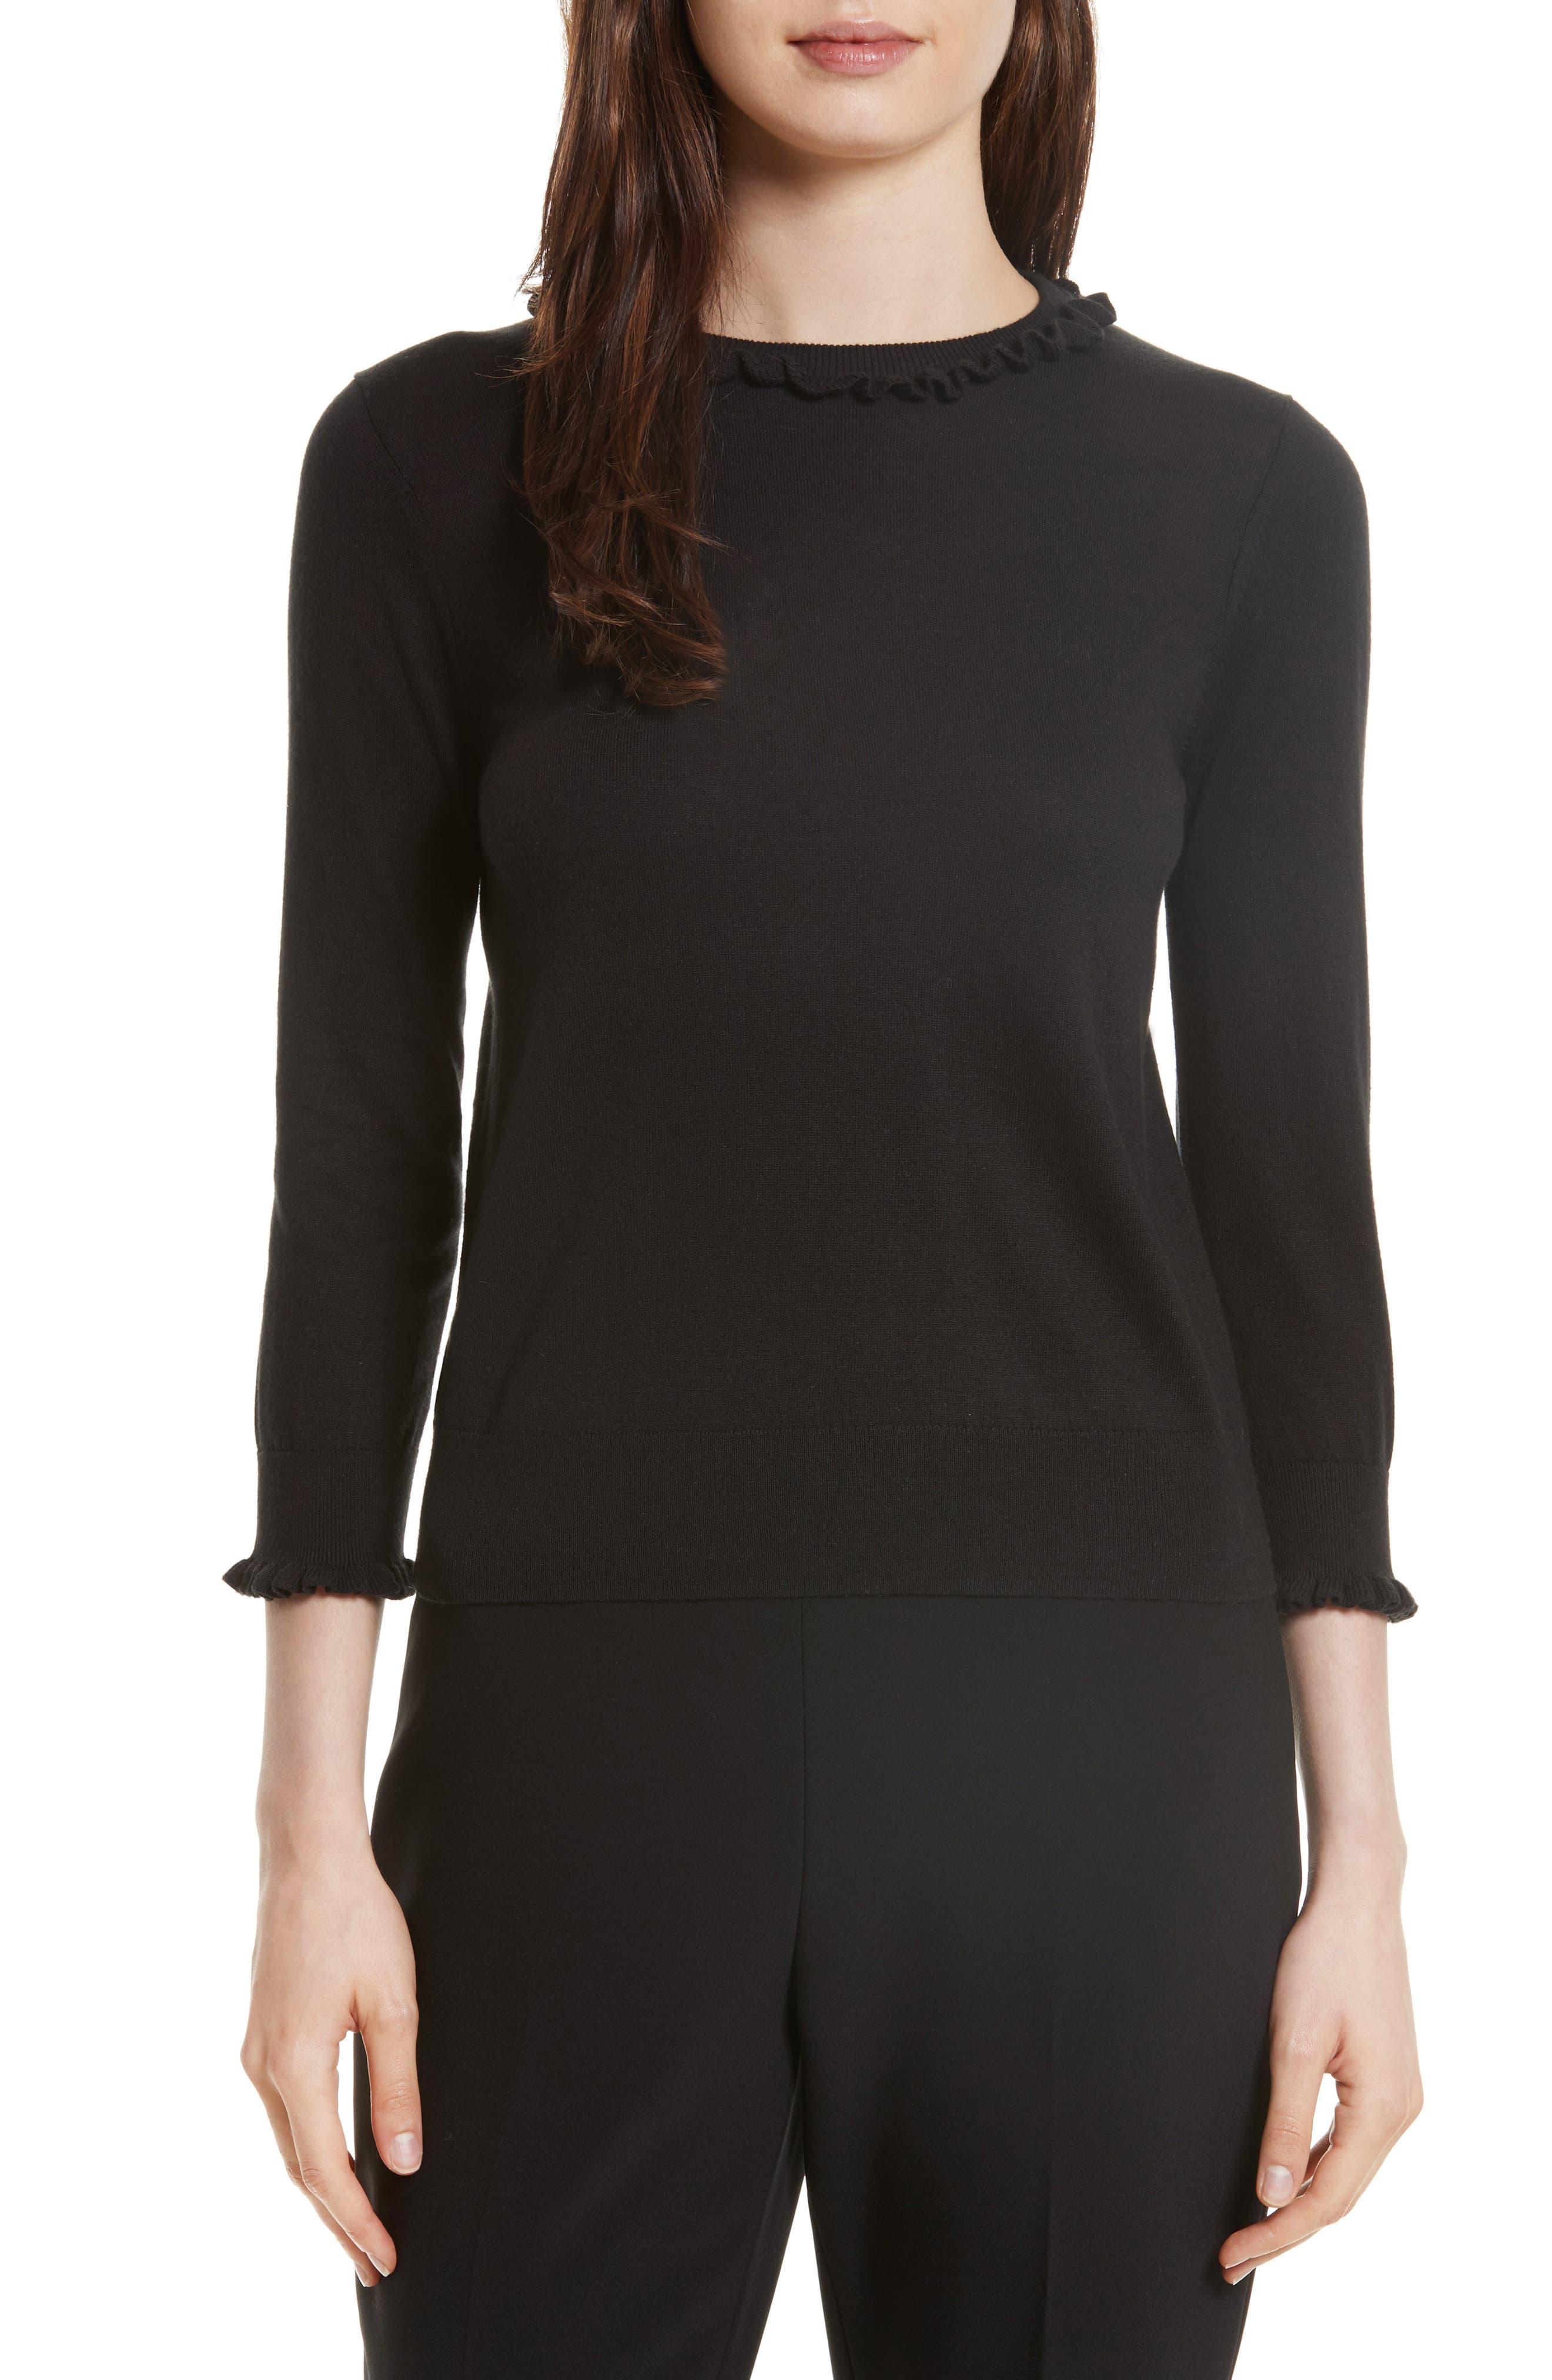 KATE SPADE NEW YORK ruffle silk blend sweater